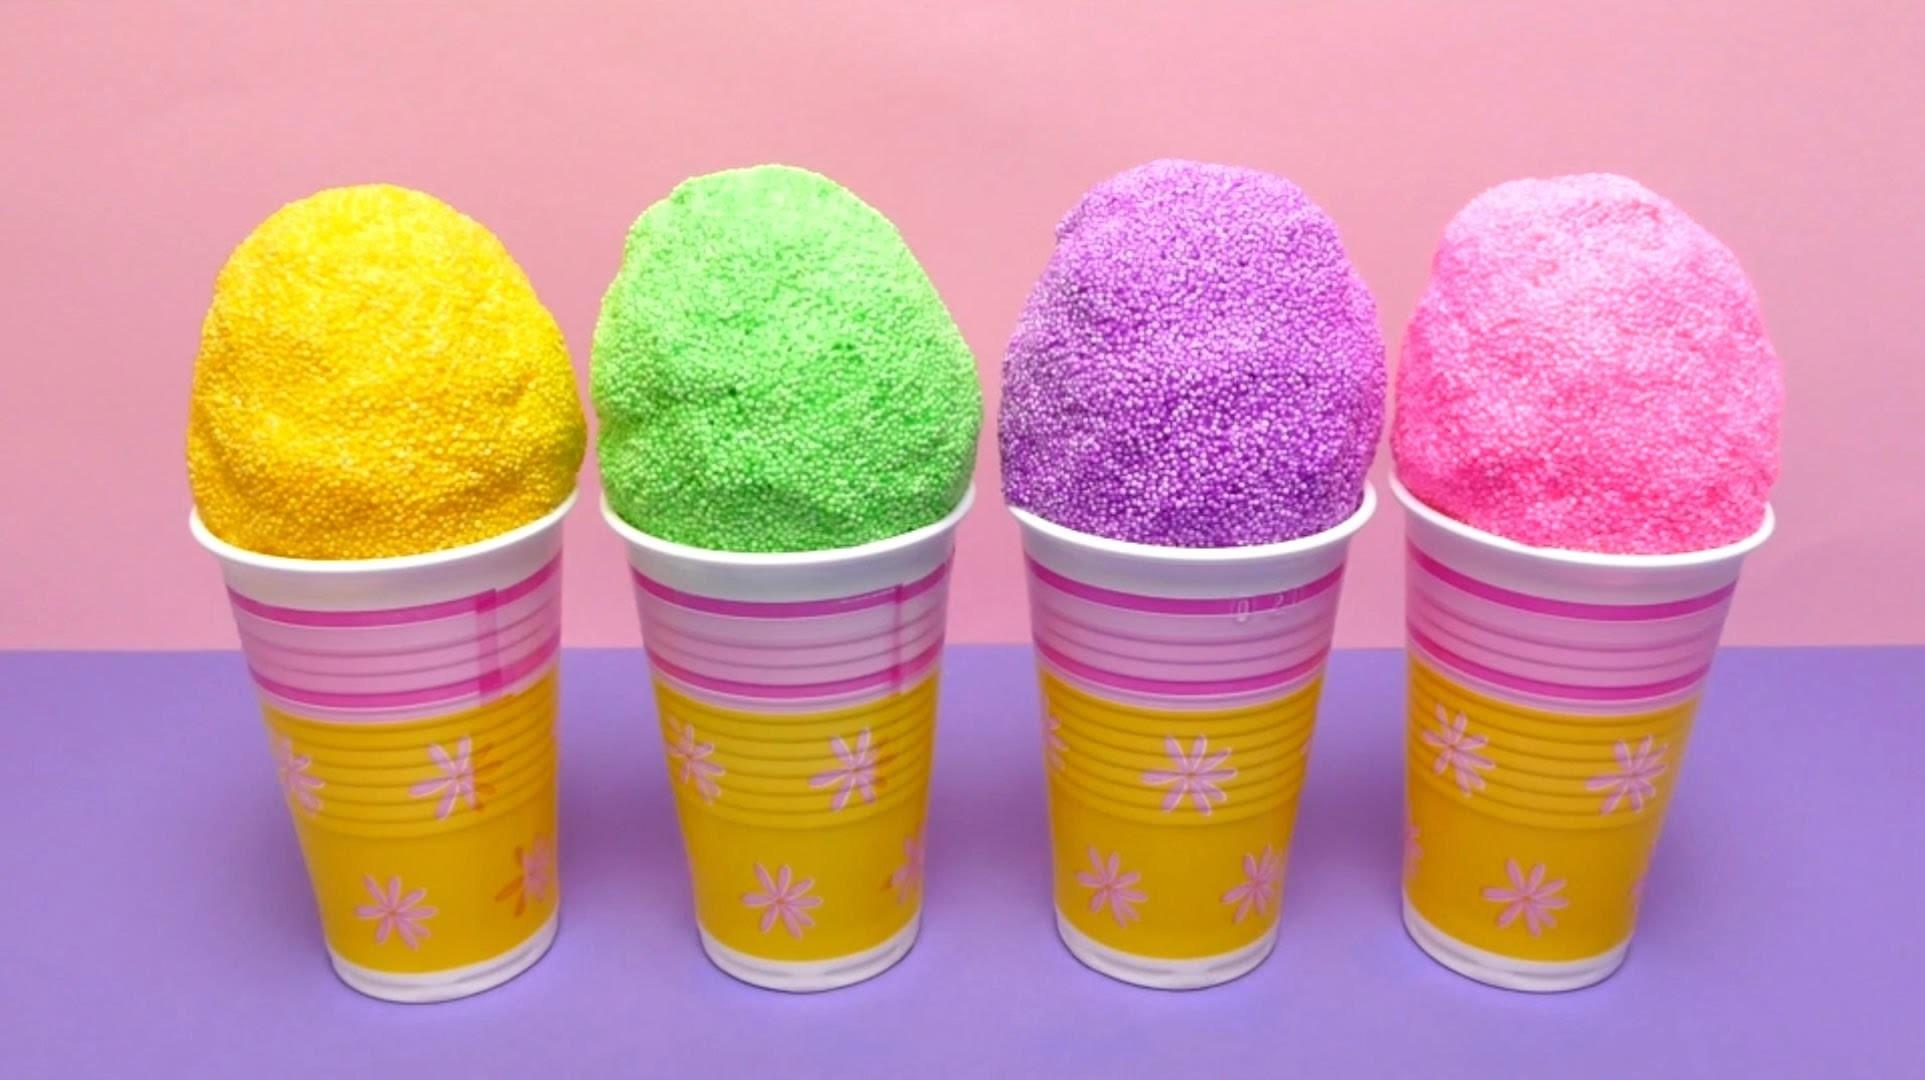 Fancy Foam Clay Surprise Eggs for Kids (Hello Kitty, Star Wars Sticker, Minion & Spider)